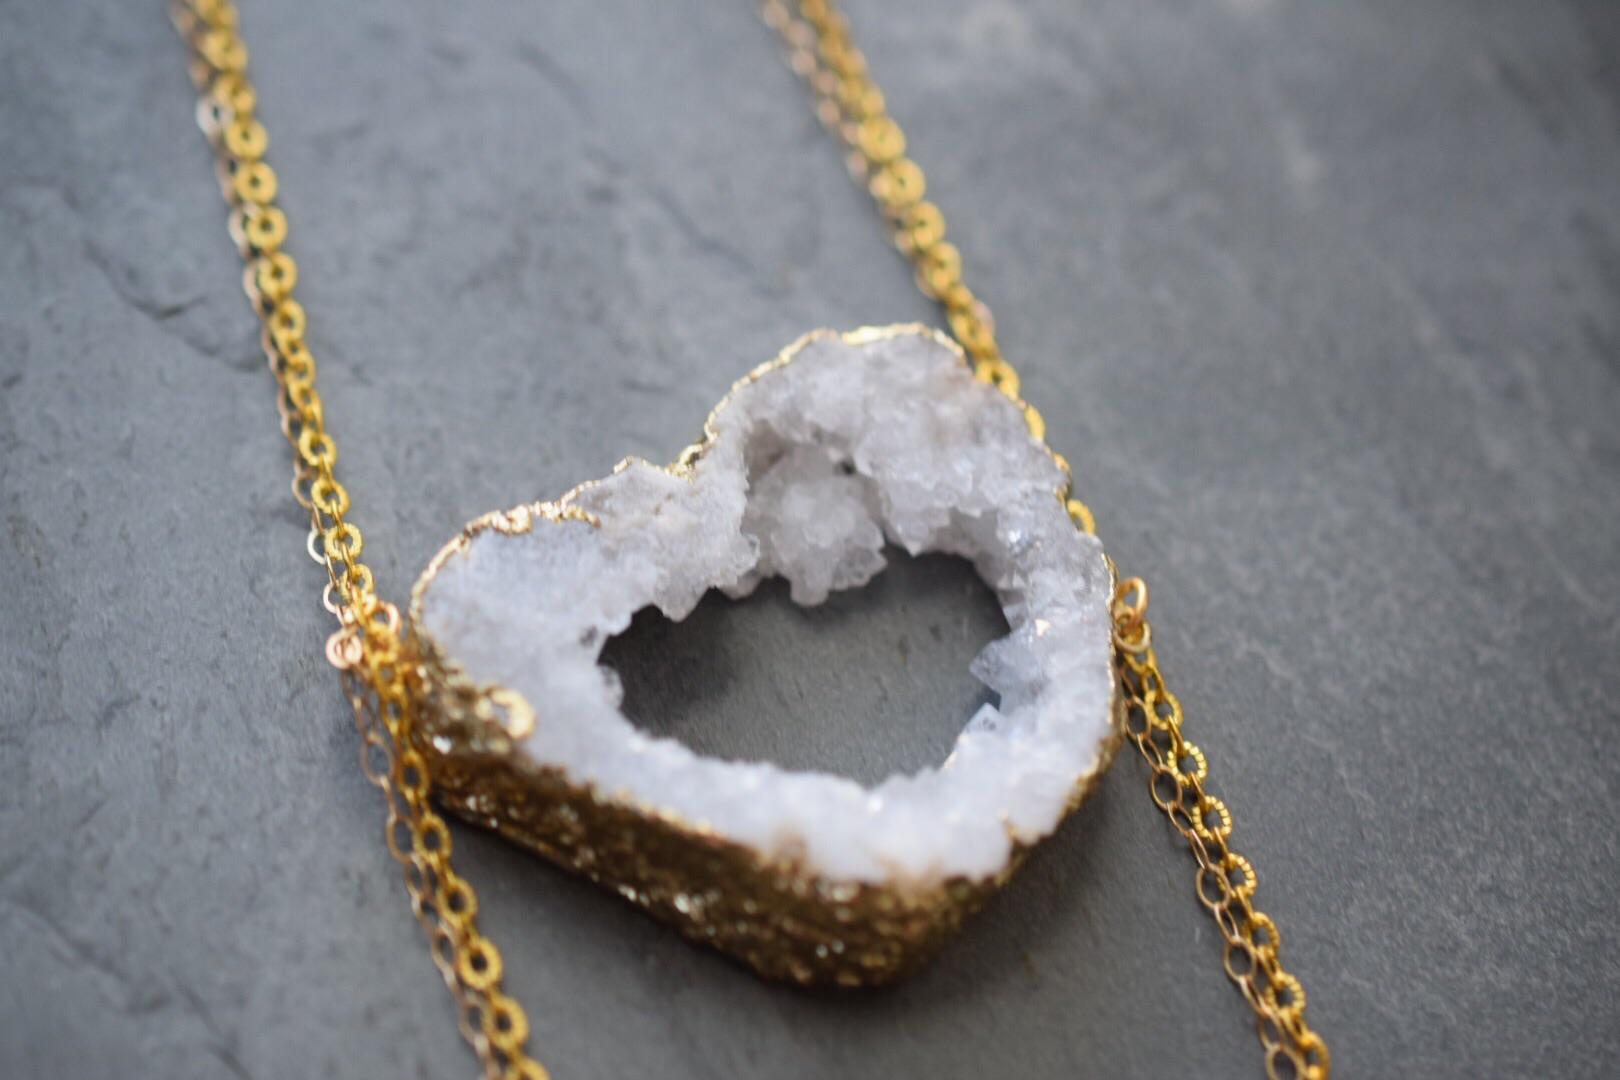 White druzy stone necklace